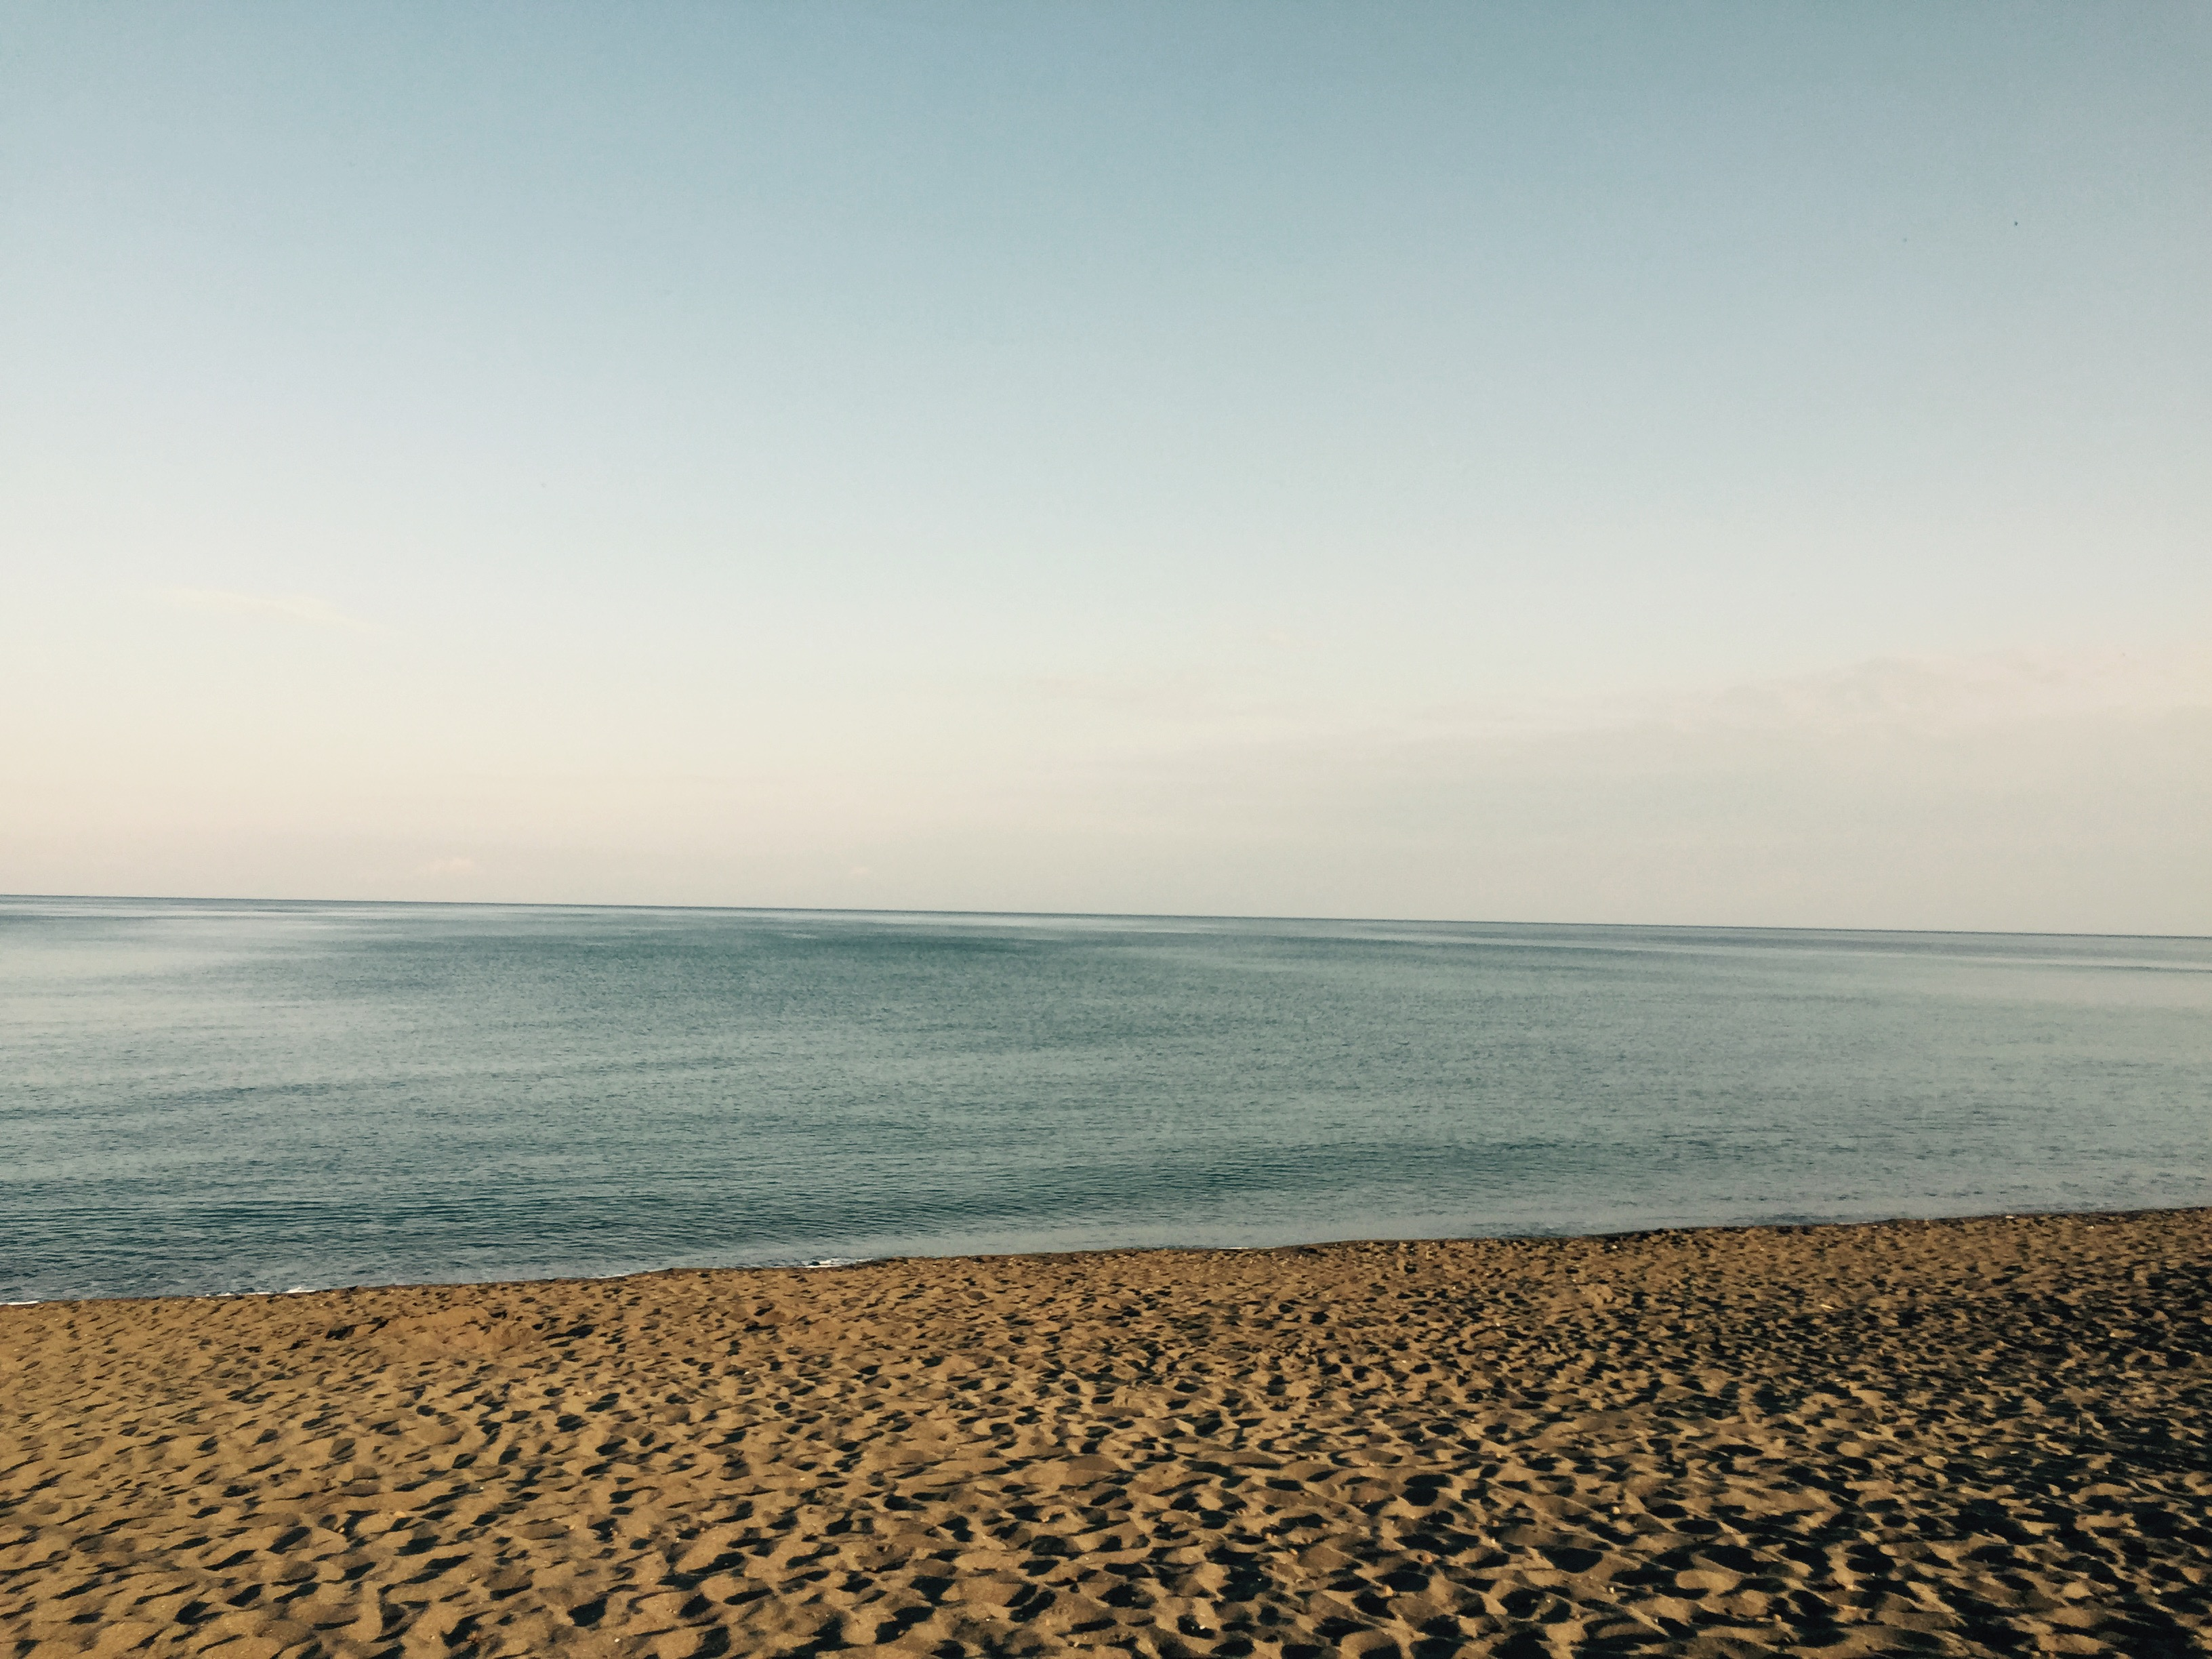 San Vincenzo spiagge più belle toscana